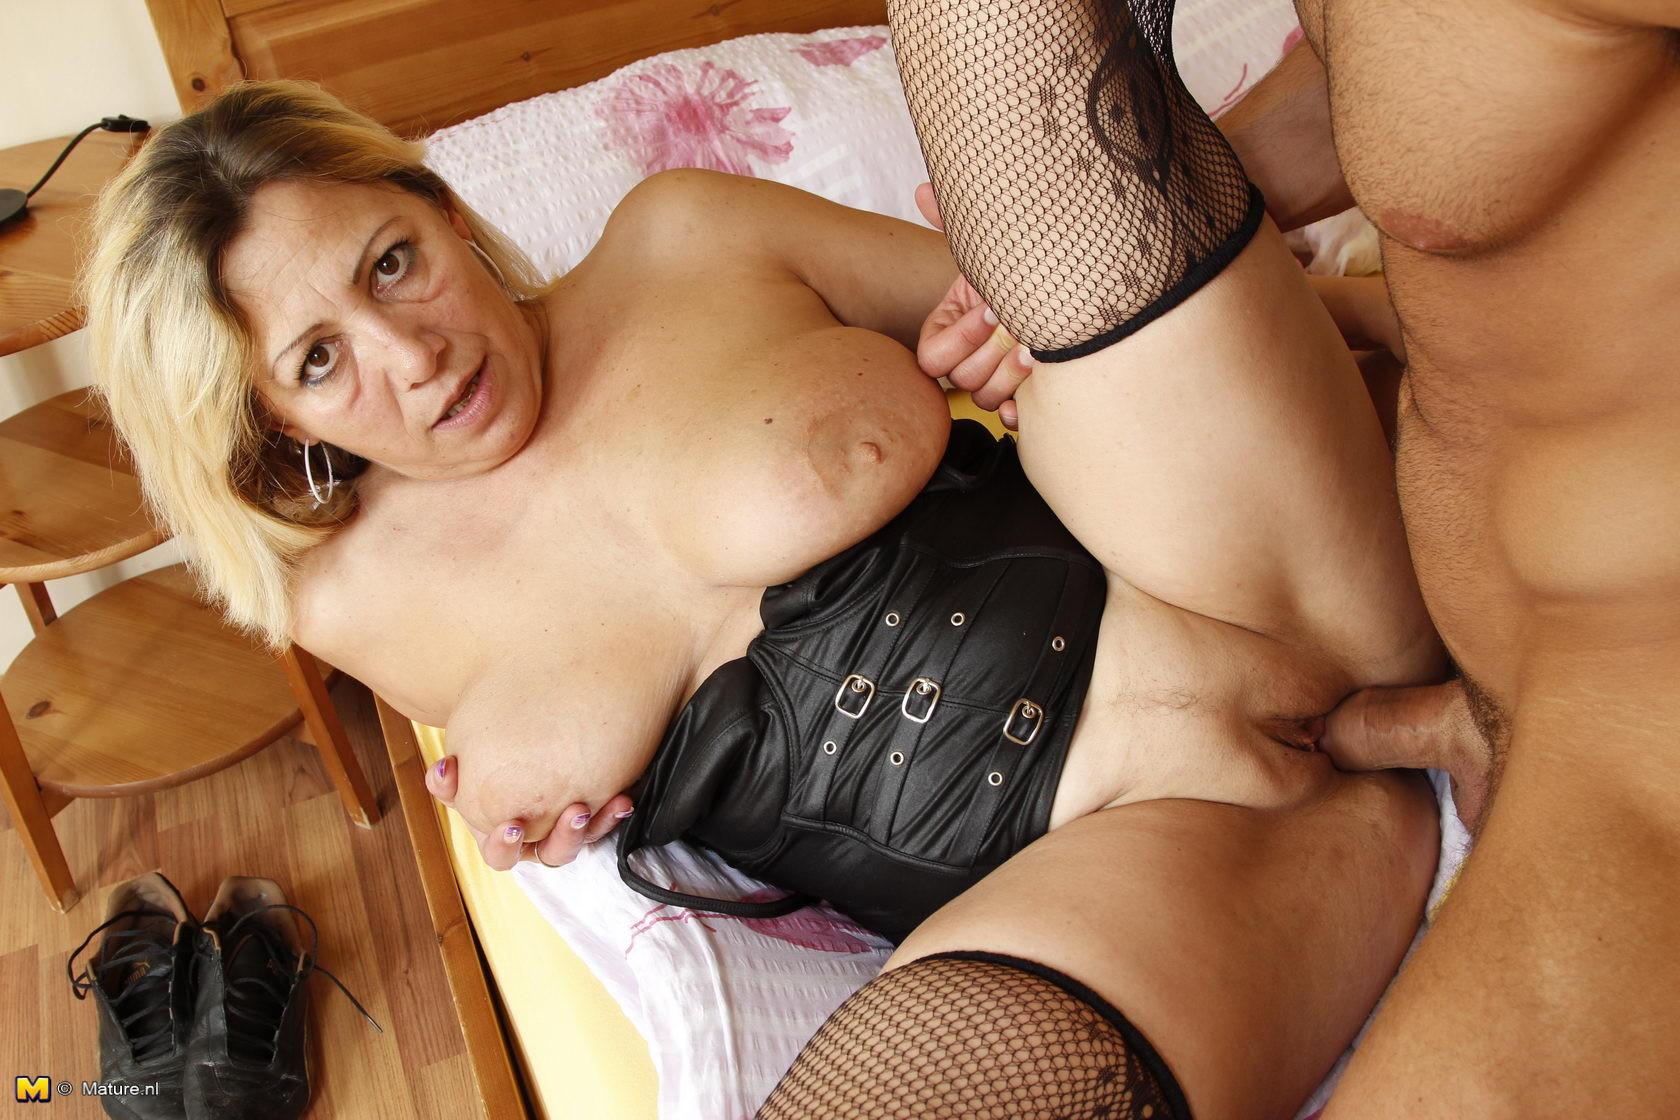 cocksucking mature slut - Pichunter